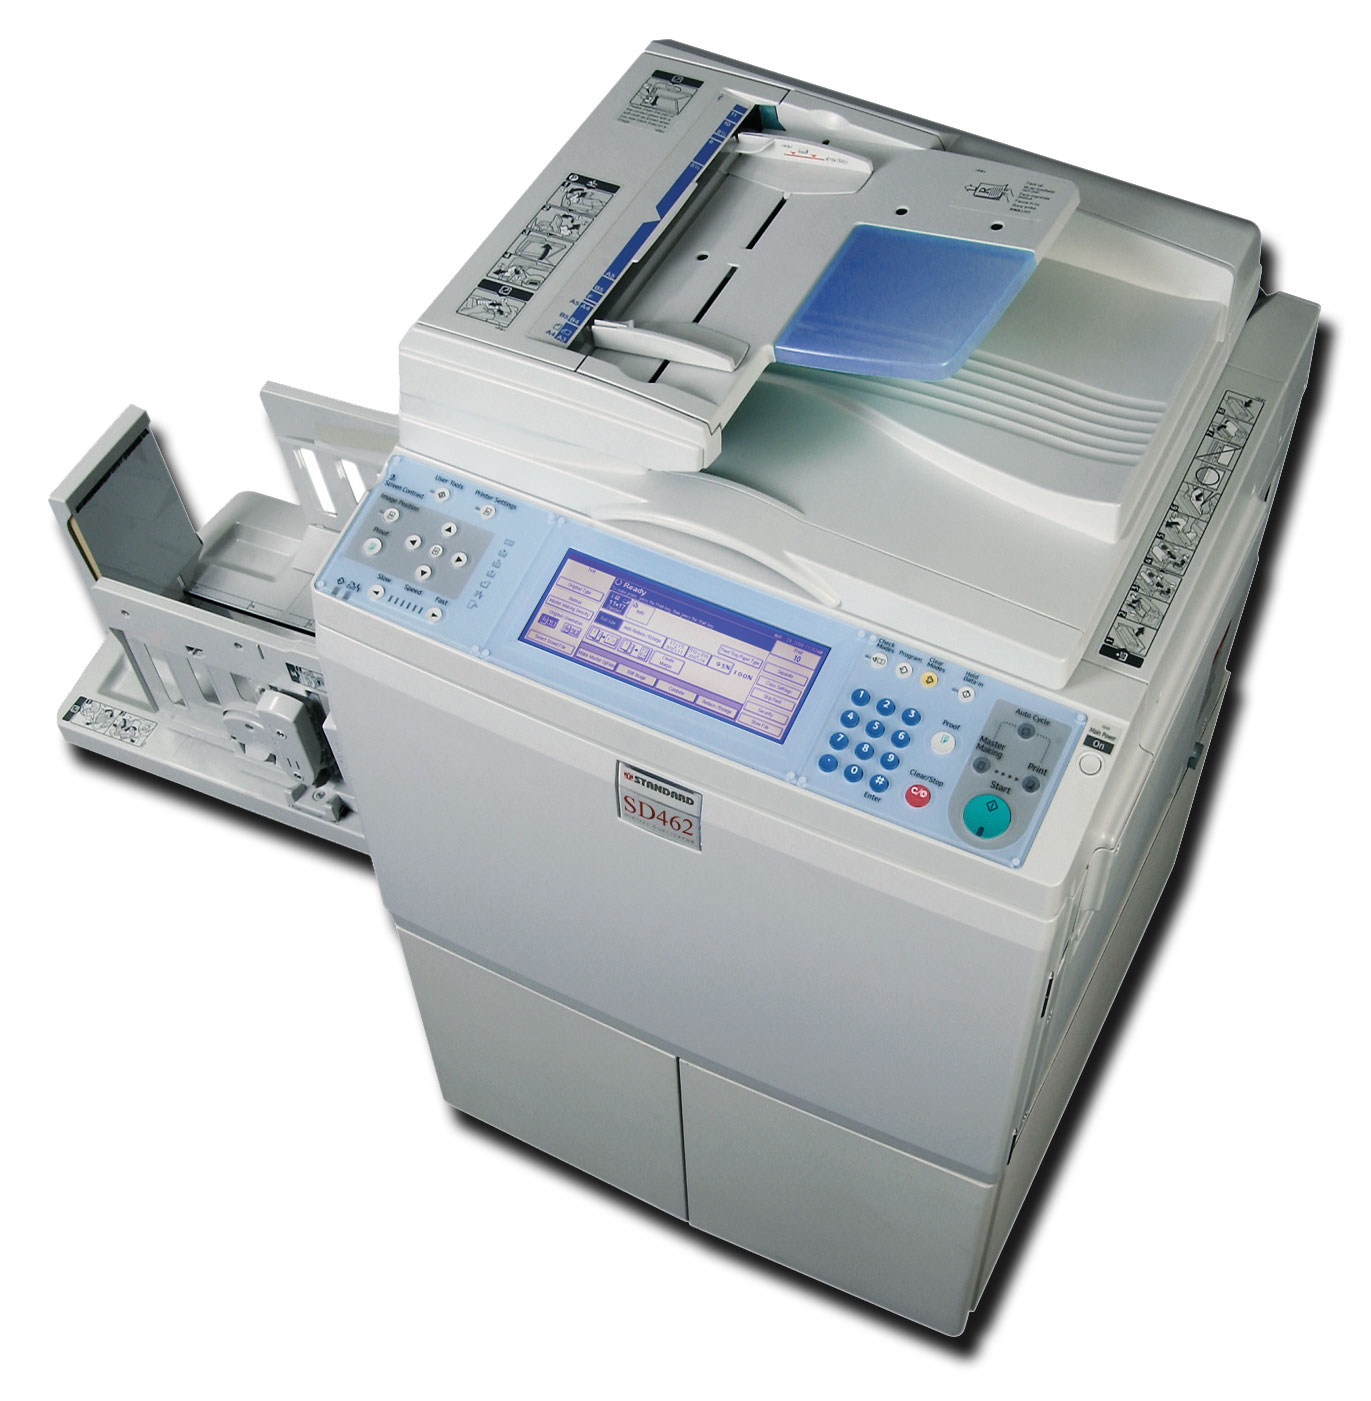 SD462 Duplicator